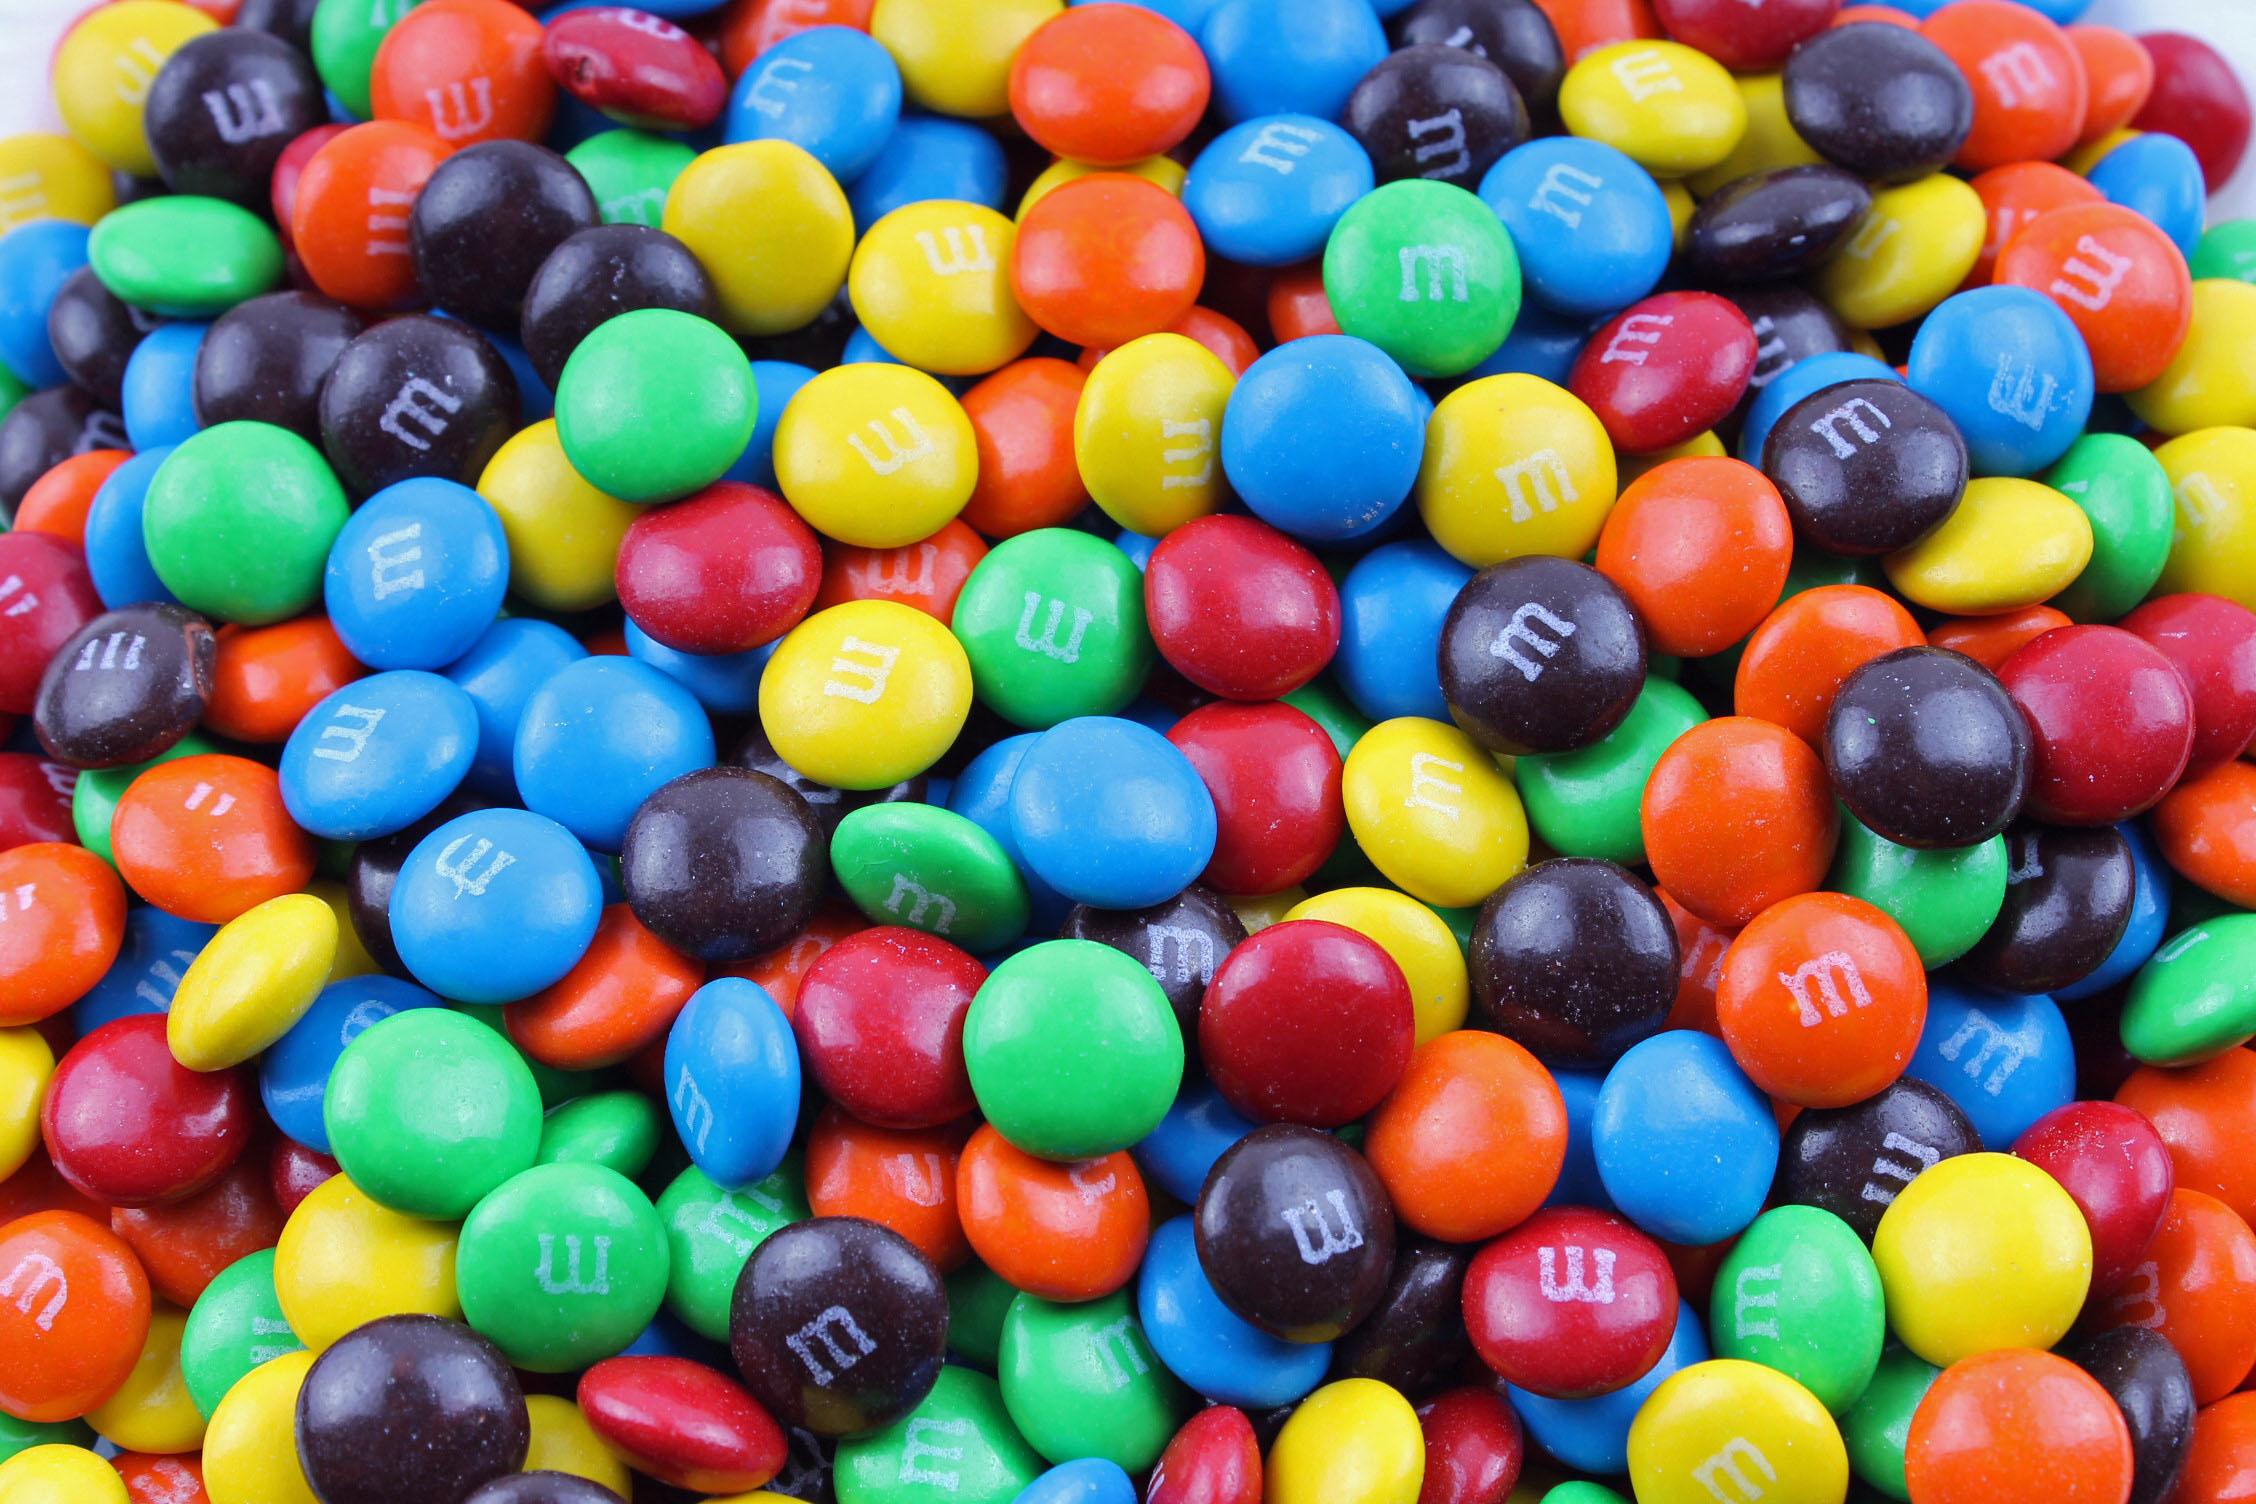 Candy-Coated Chocolate Pieces III Shirlybeth Chan